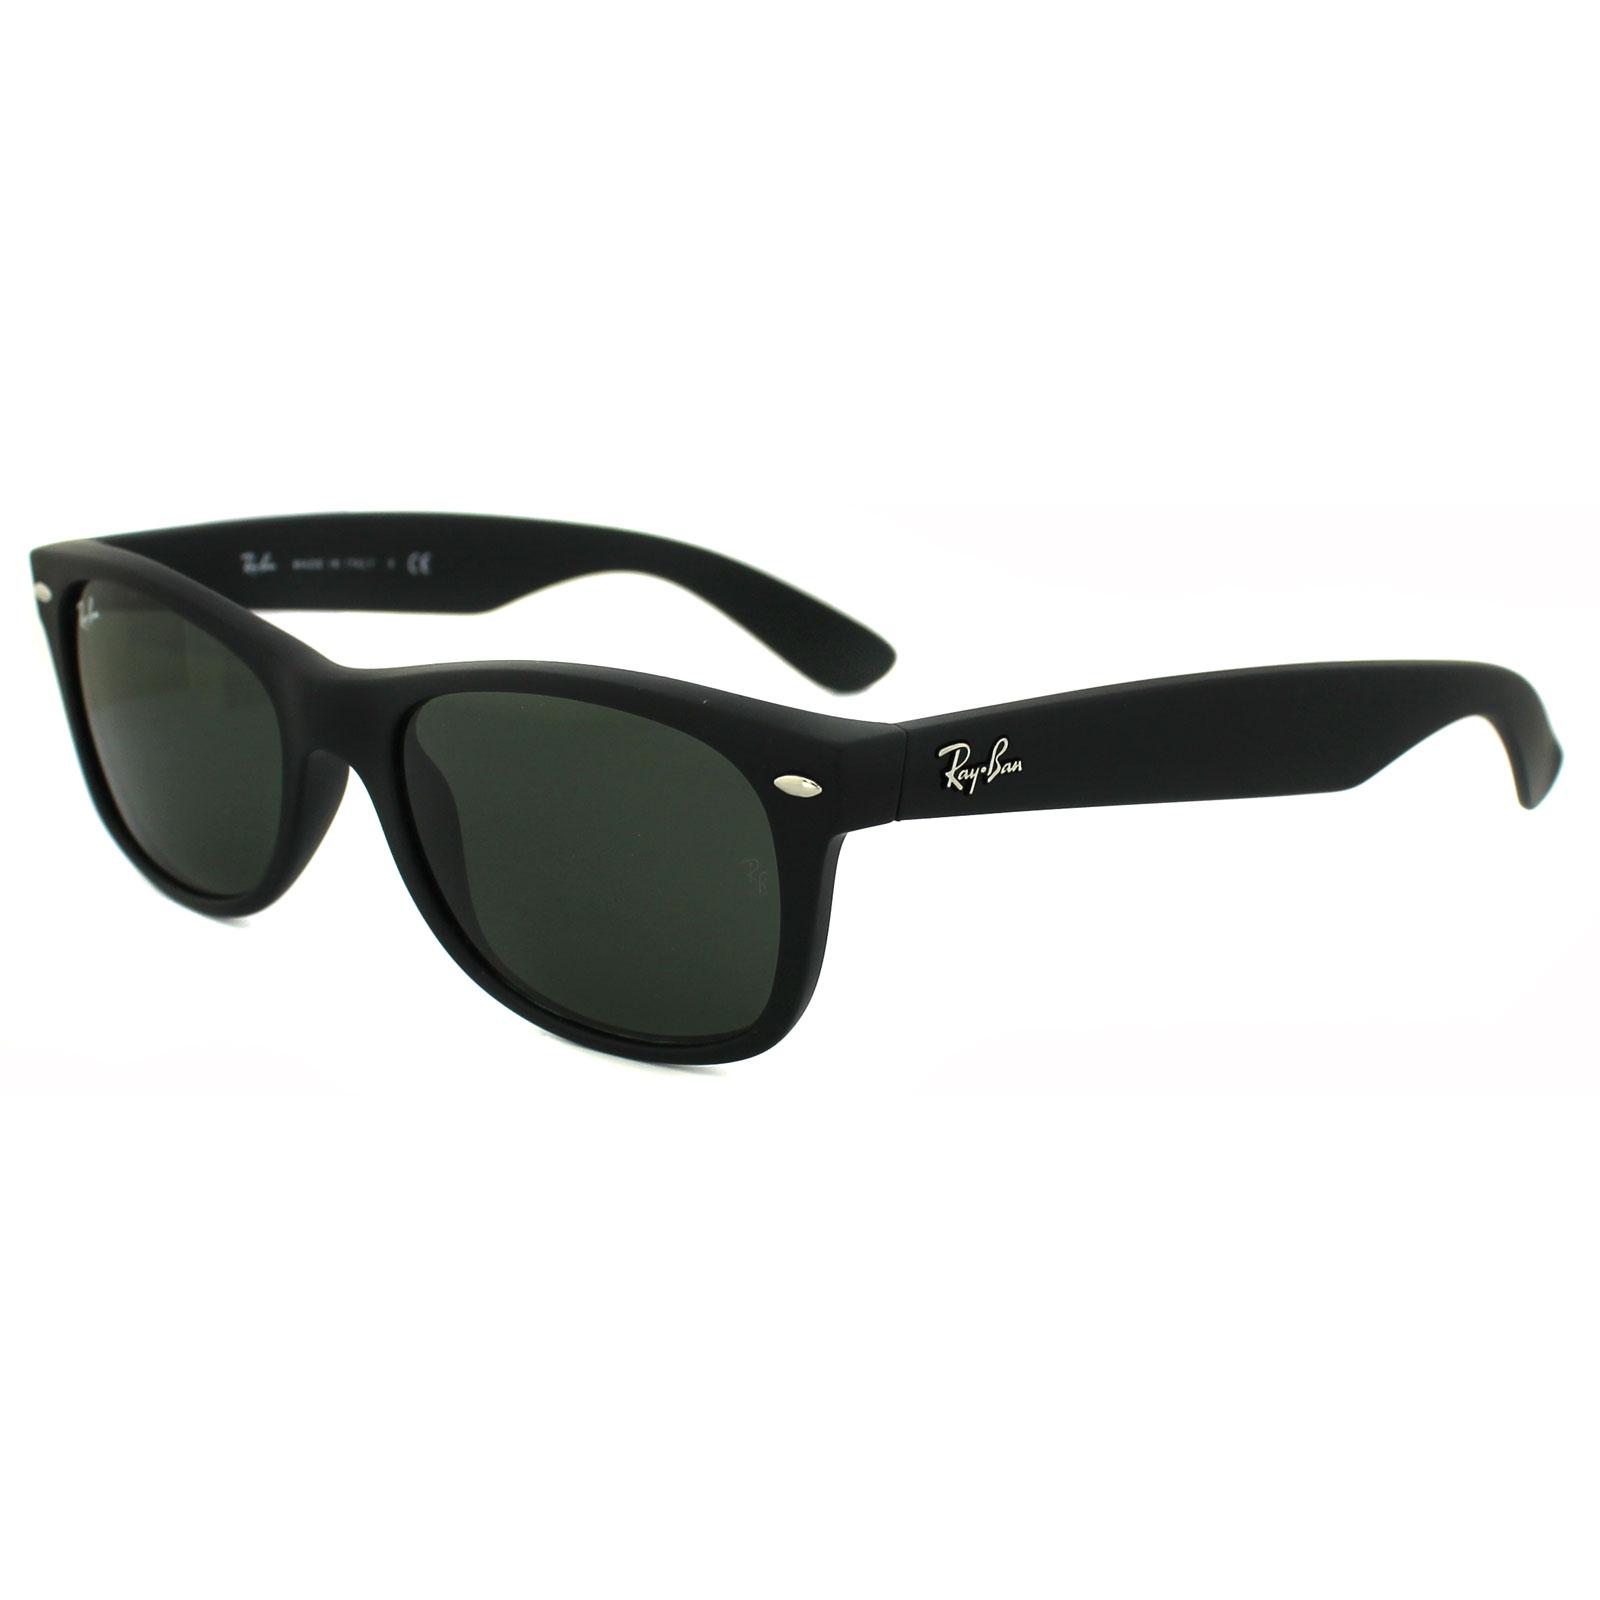 Ray Ban Sunglasses New Wayfarer 2132 622 Black Rubber